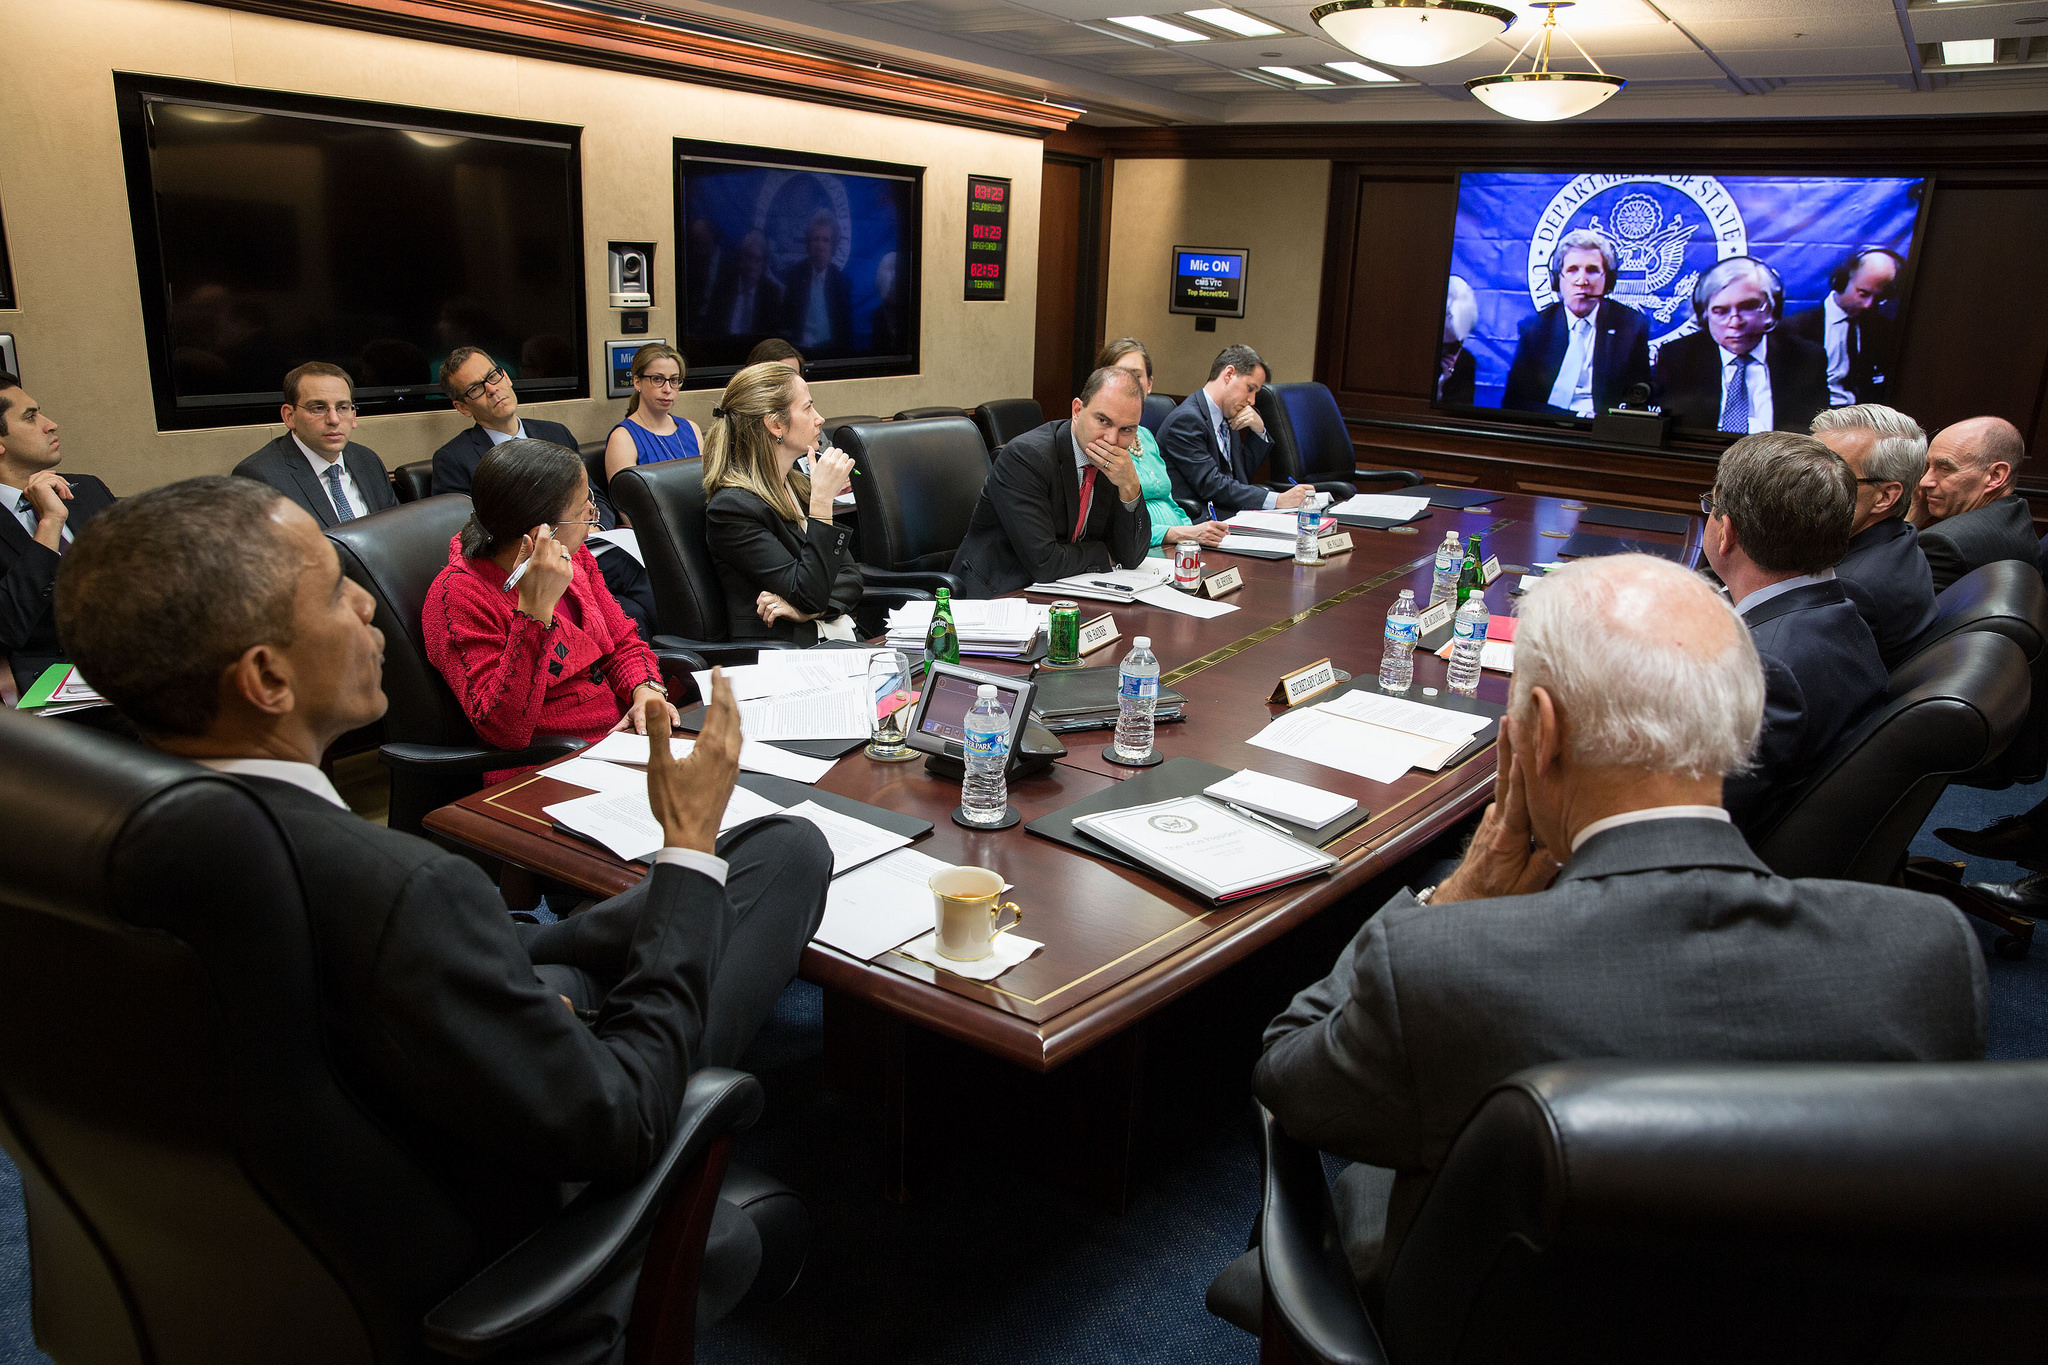 Obama Biden Situation Room 2015